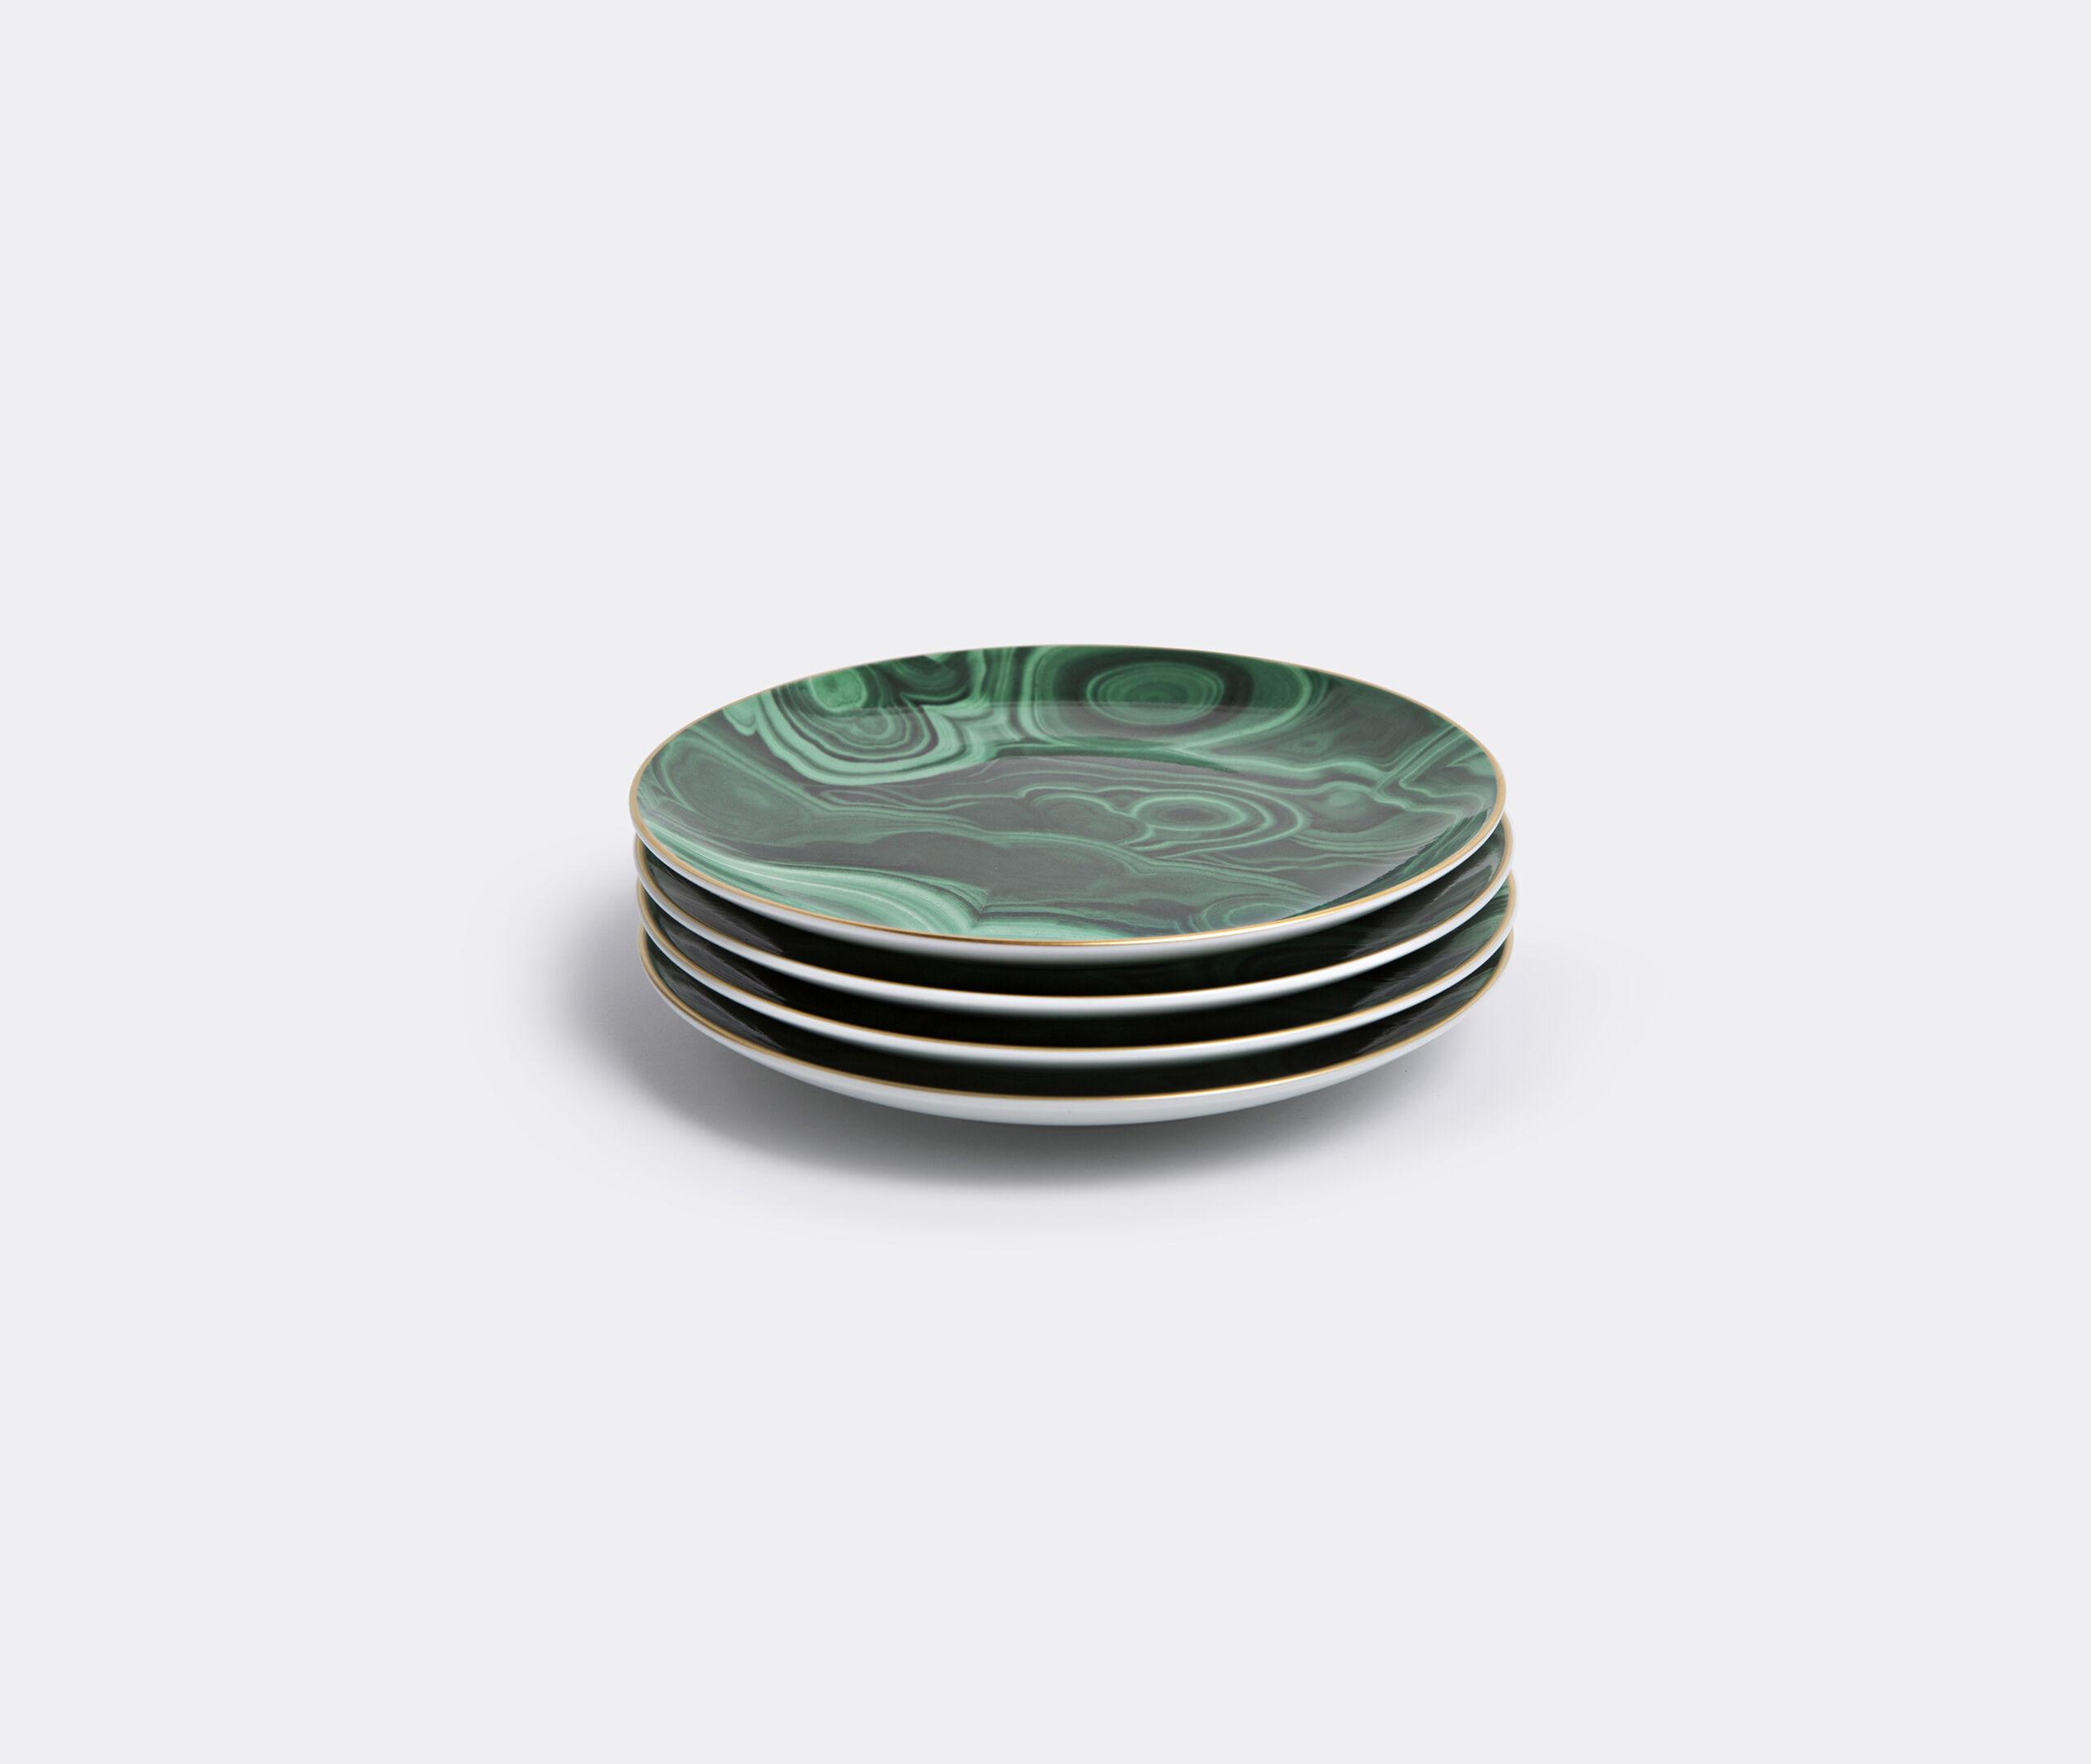 Malachite Canape Plate (Set Of 4)